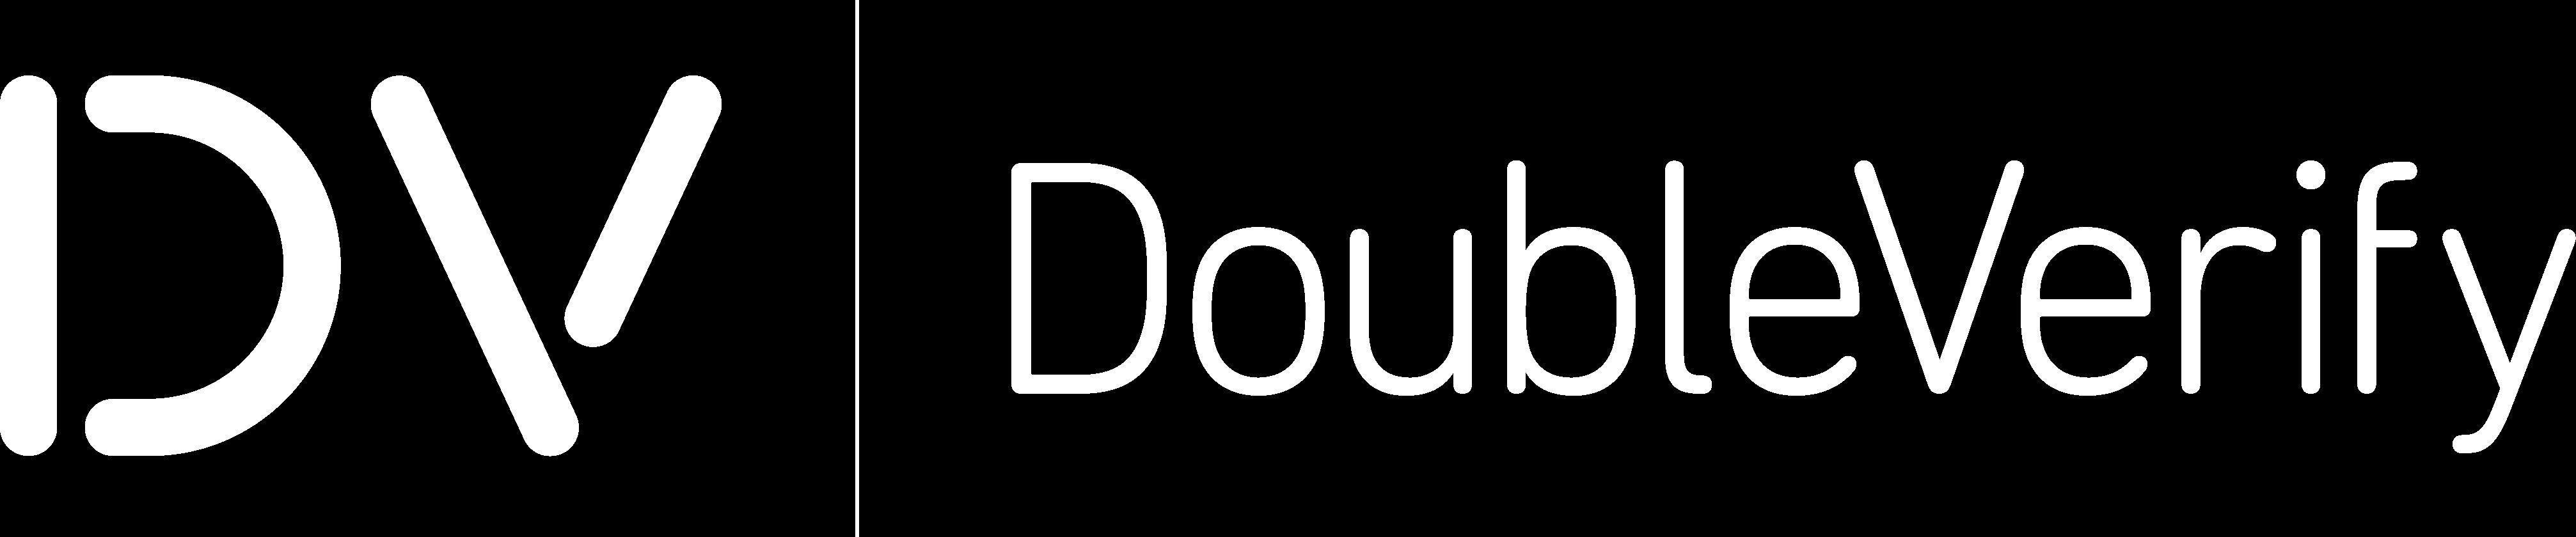 dv_logo2019_horizontal_allwhite